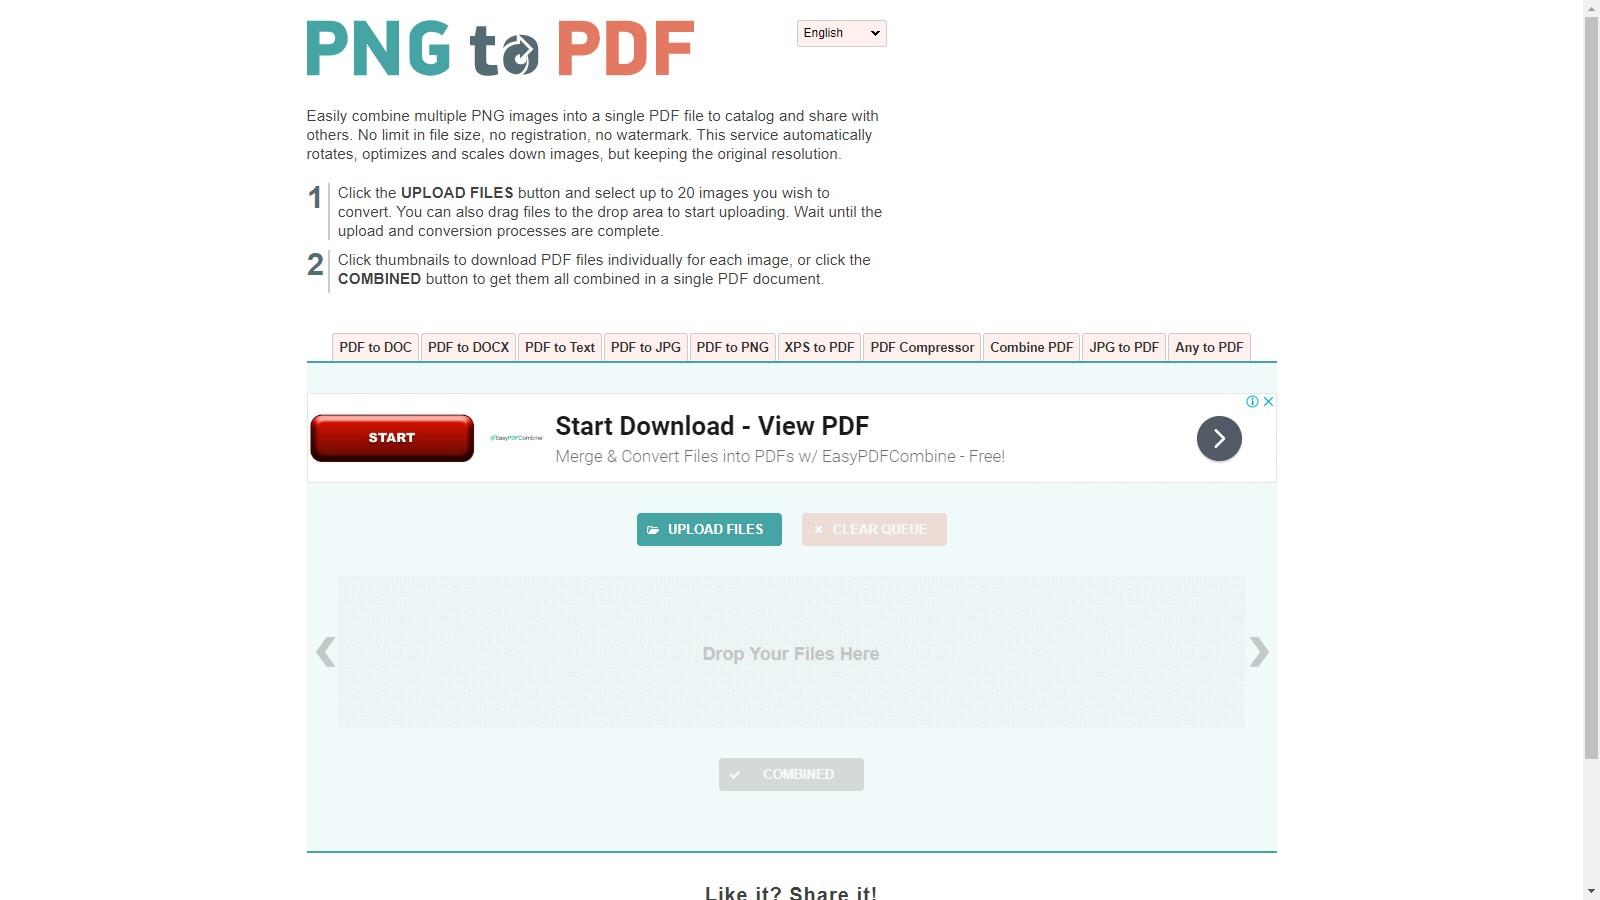 pngtopdf png to pdf converter